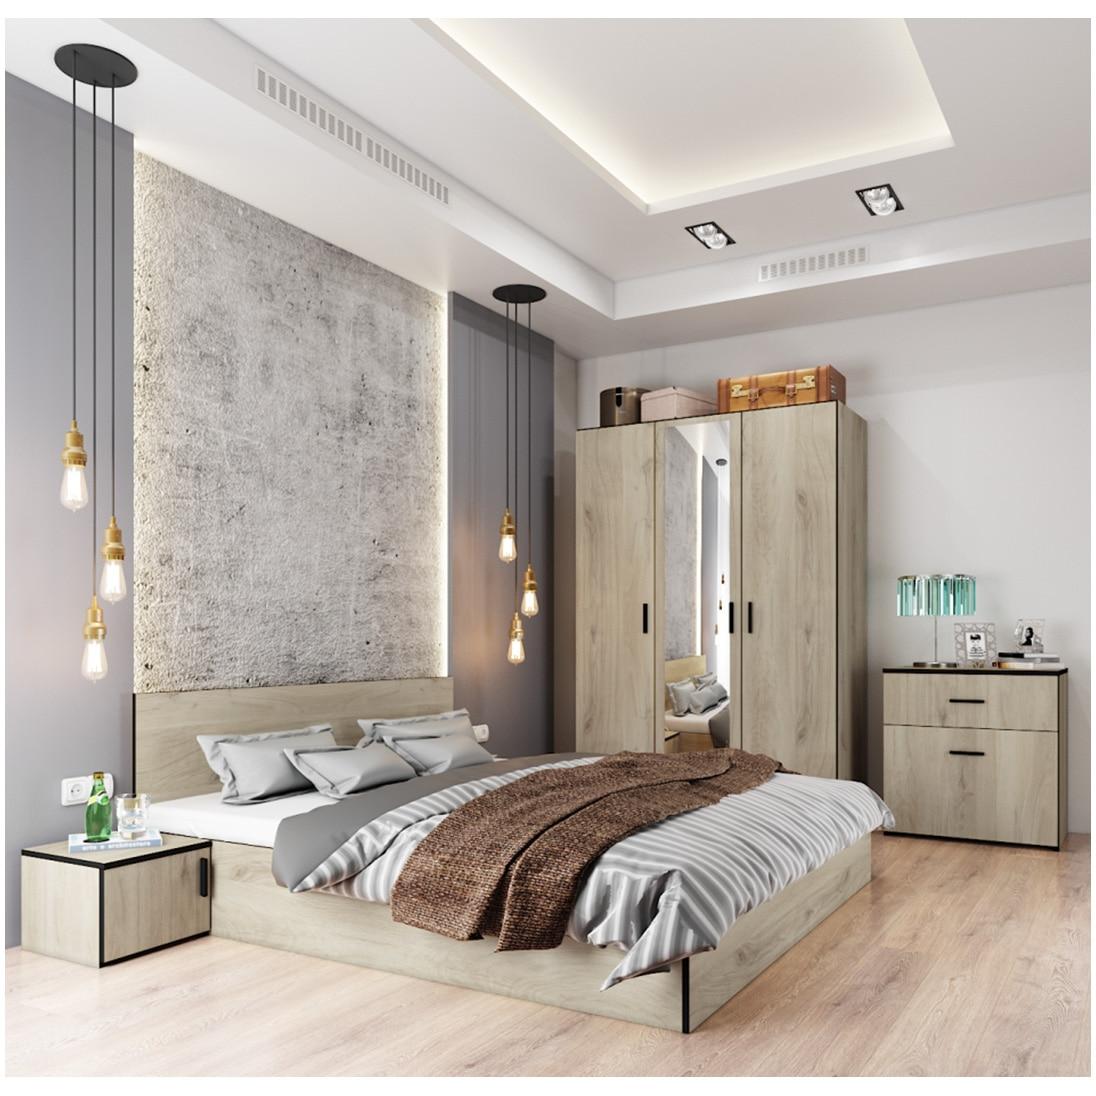 Fotografie Dormitor Irim Treff , Pat 160x200 cm, Dulap, 2 Noptiere, Comoda, Culoare Castan